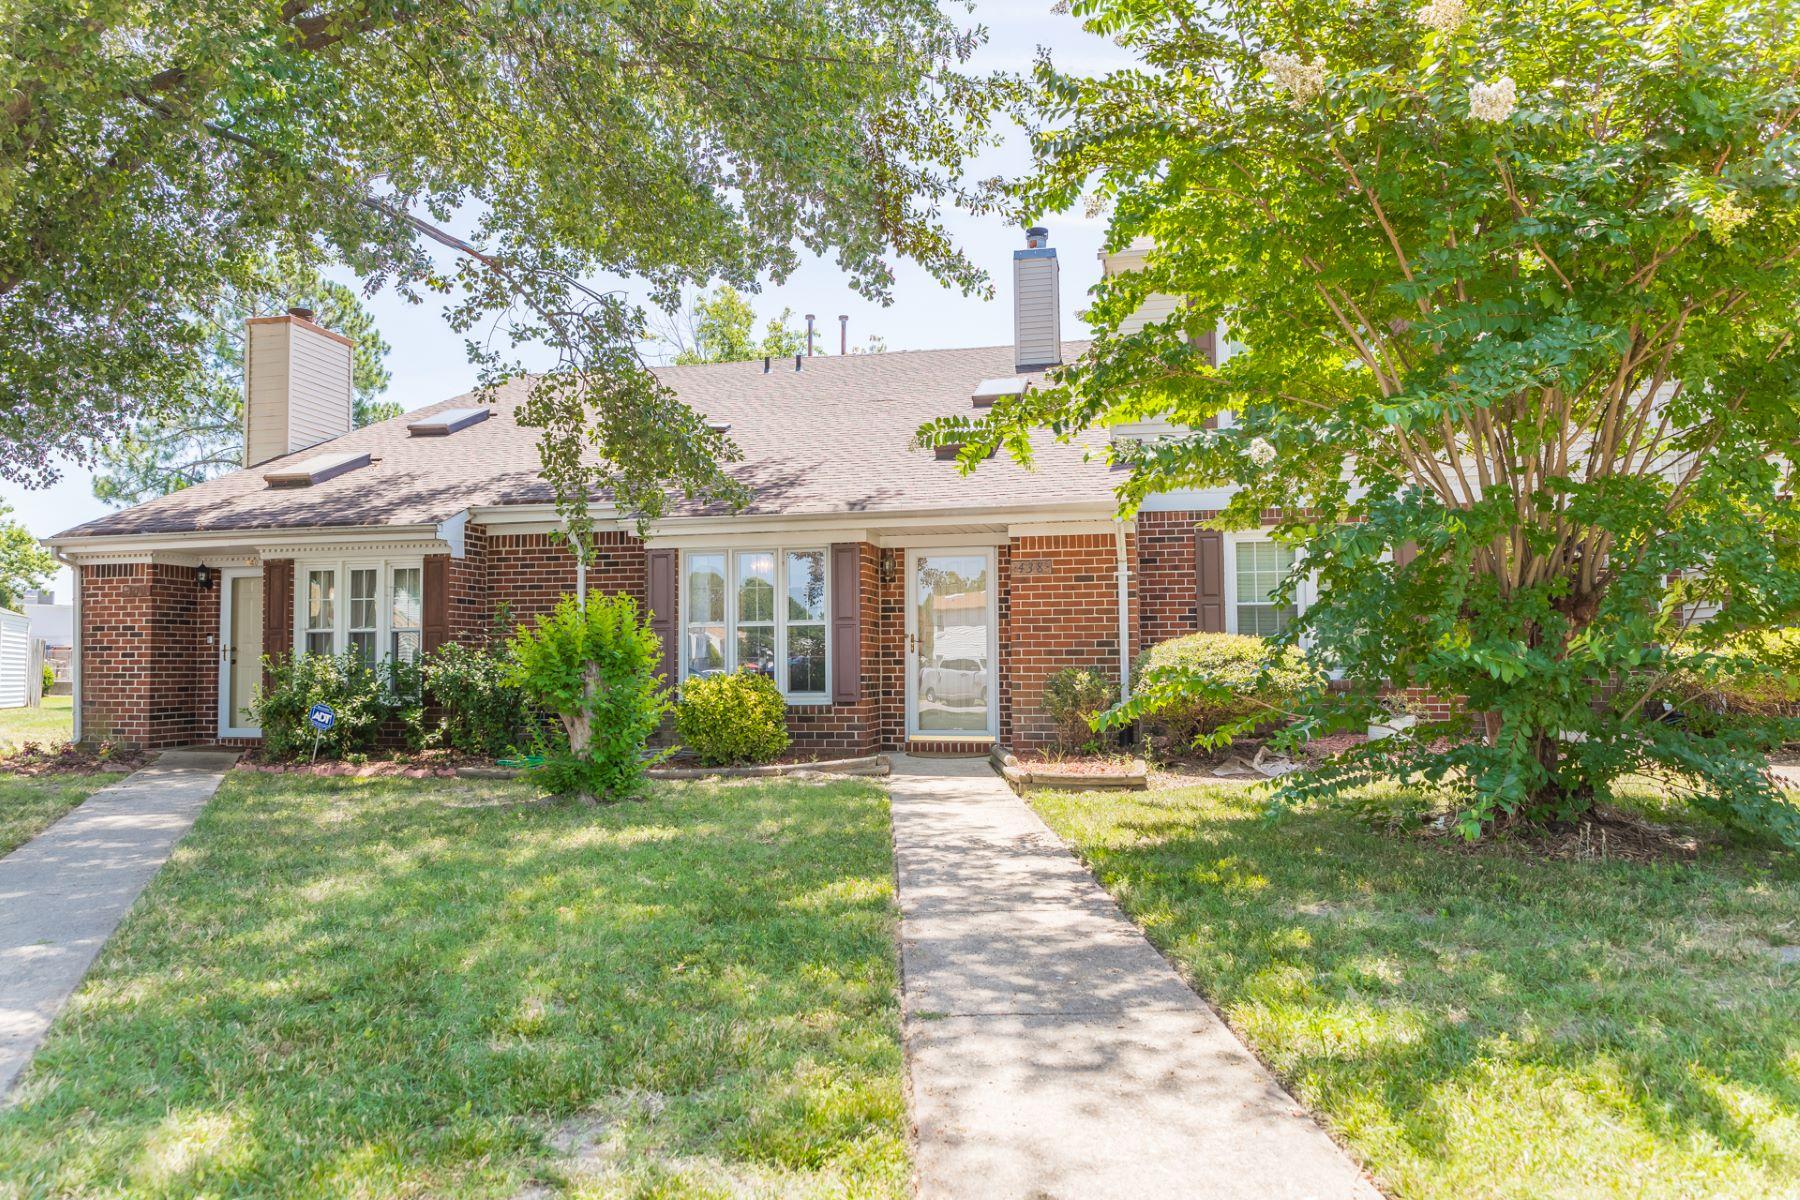 townhouses for Sale at Threechopt Village 438 Hollomon Drive Hampton, Virginia 23666 United States